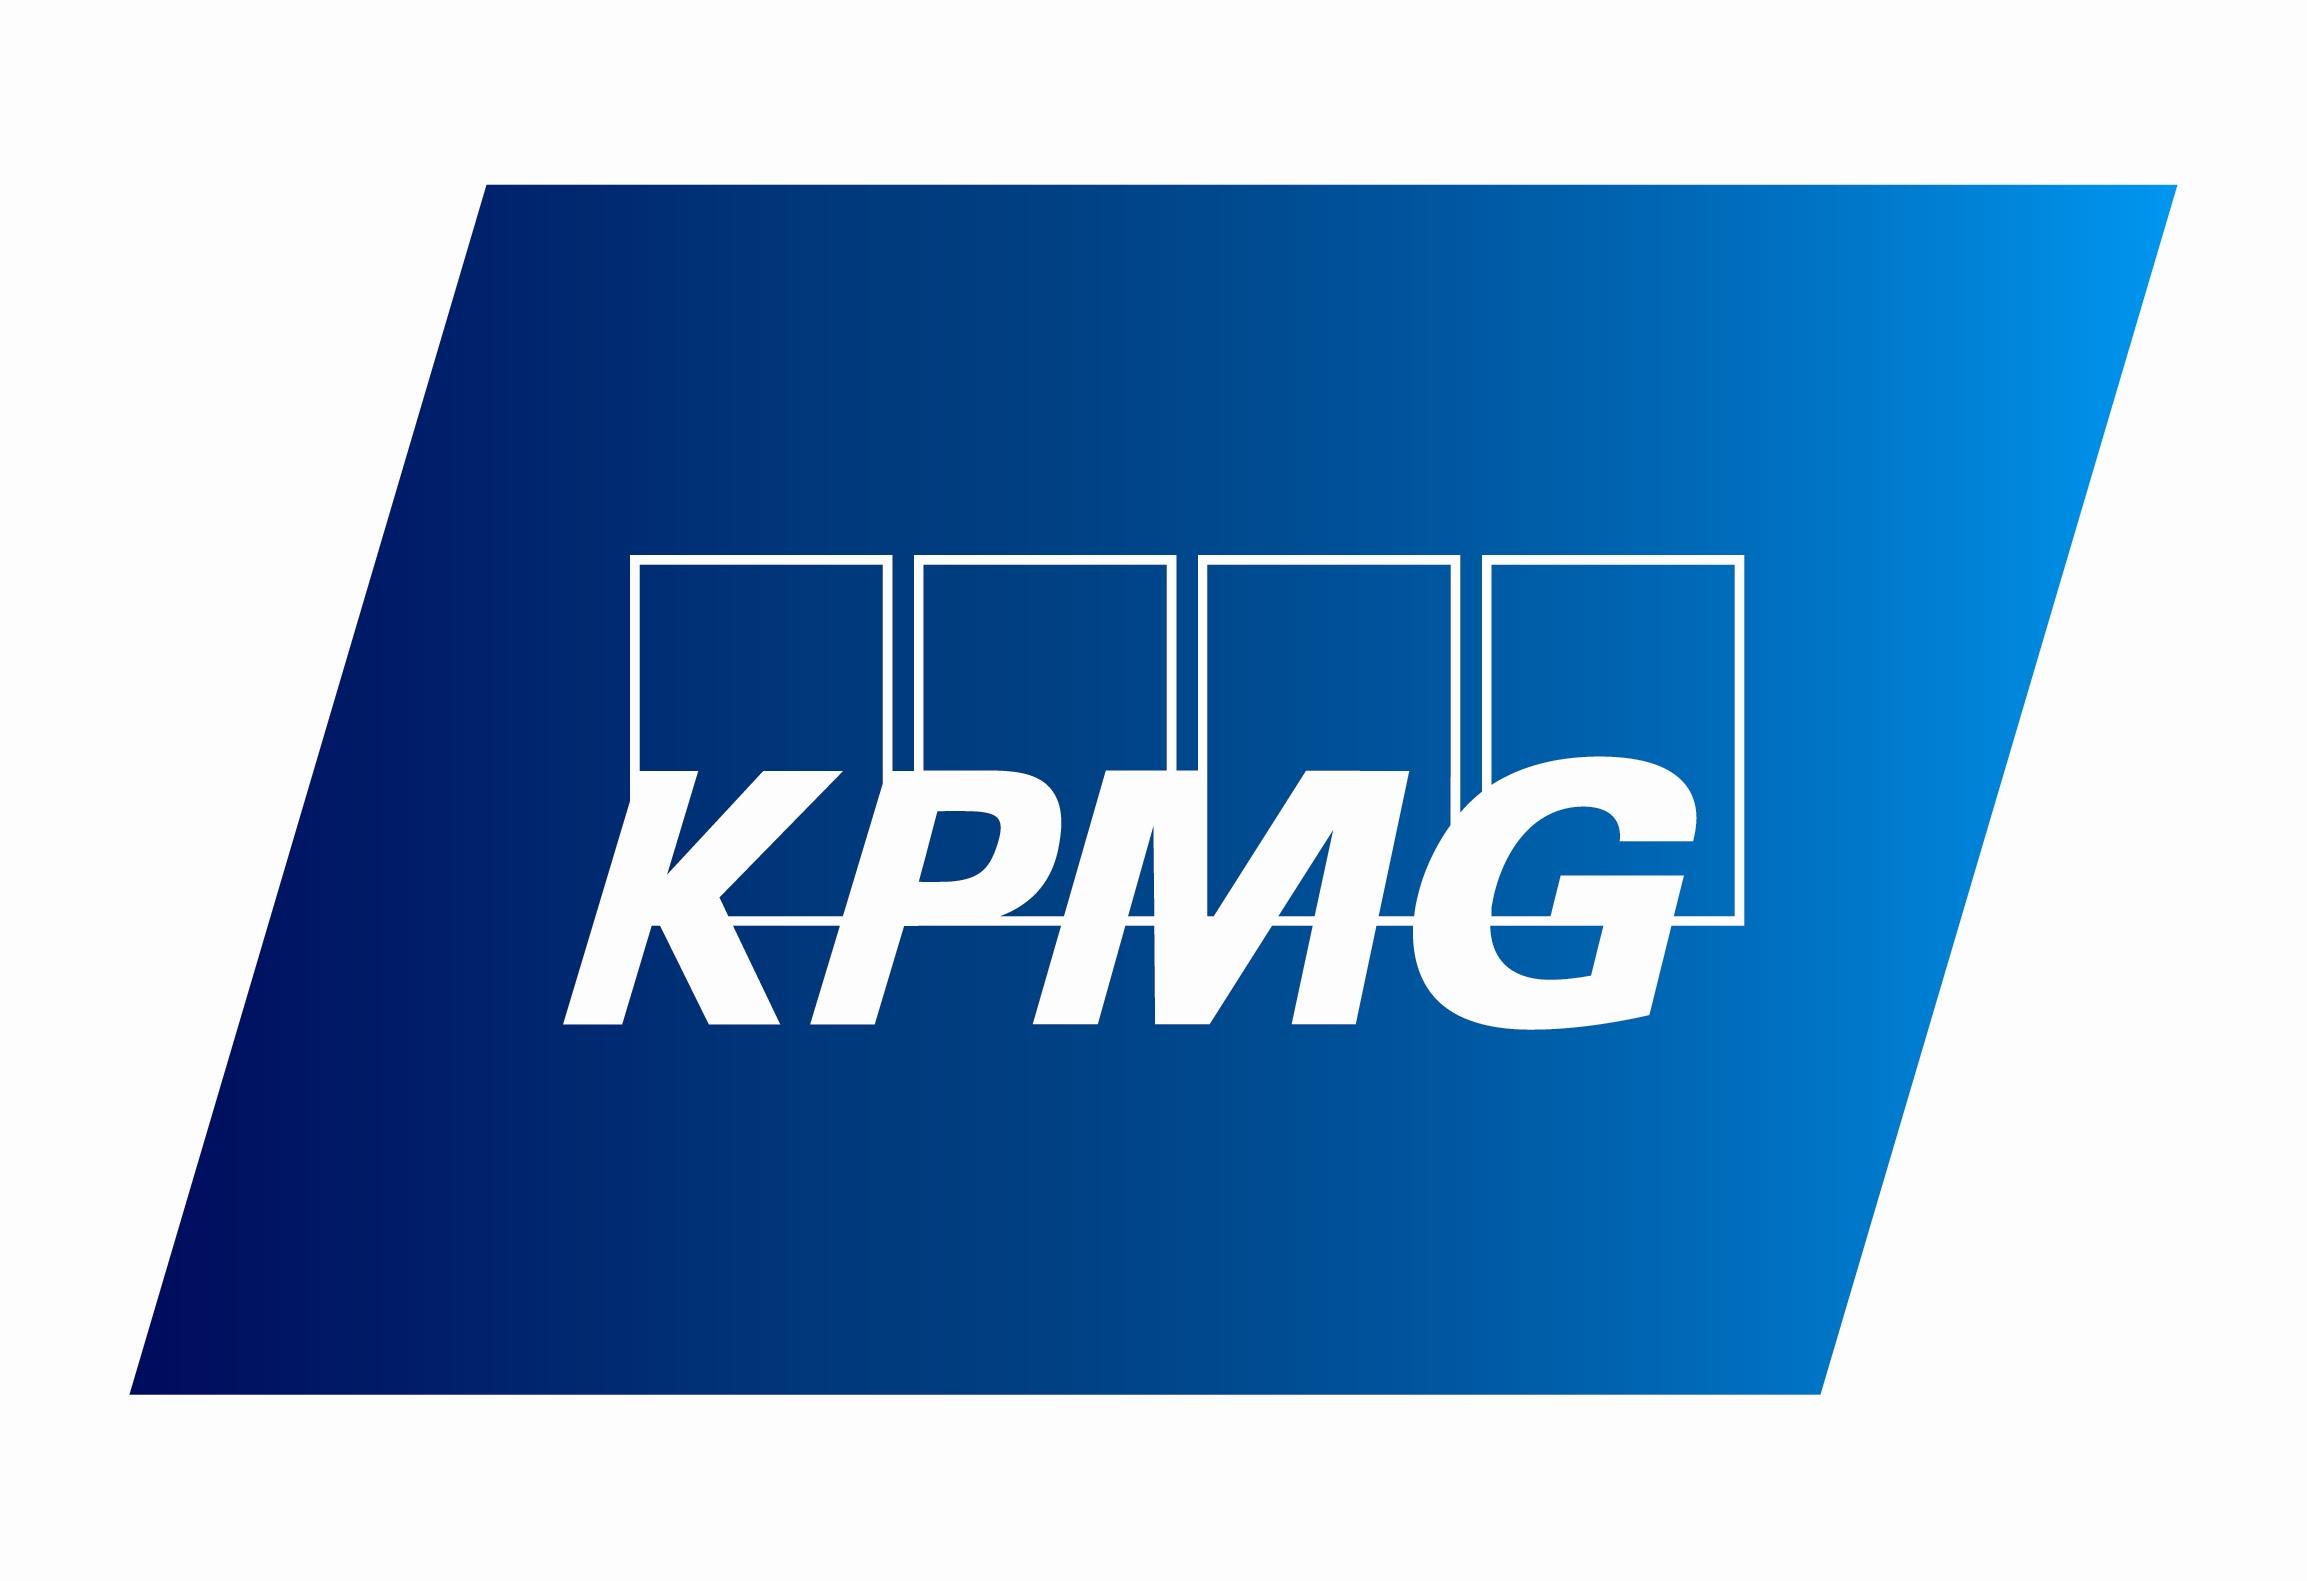 D Kpmg Discover Program Pace University Eportfolio